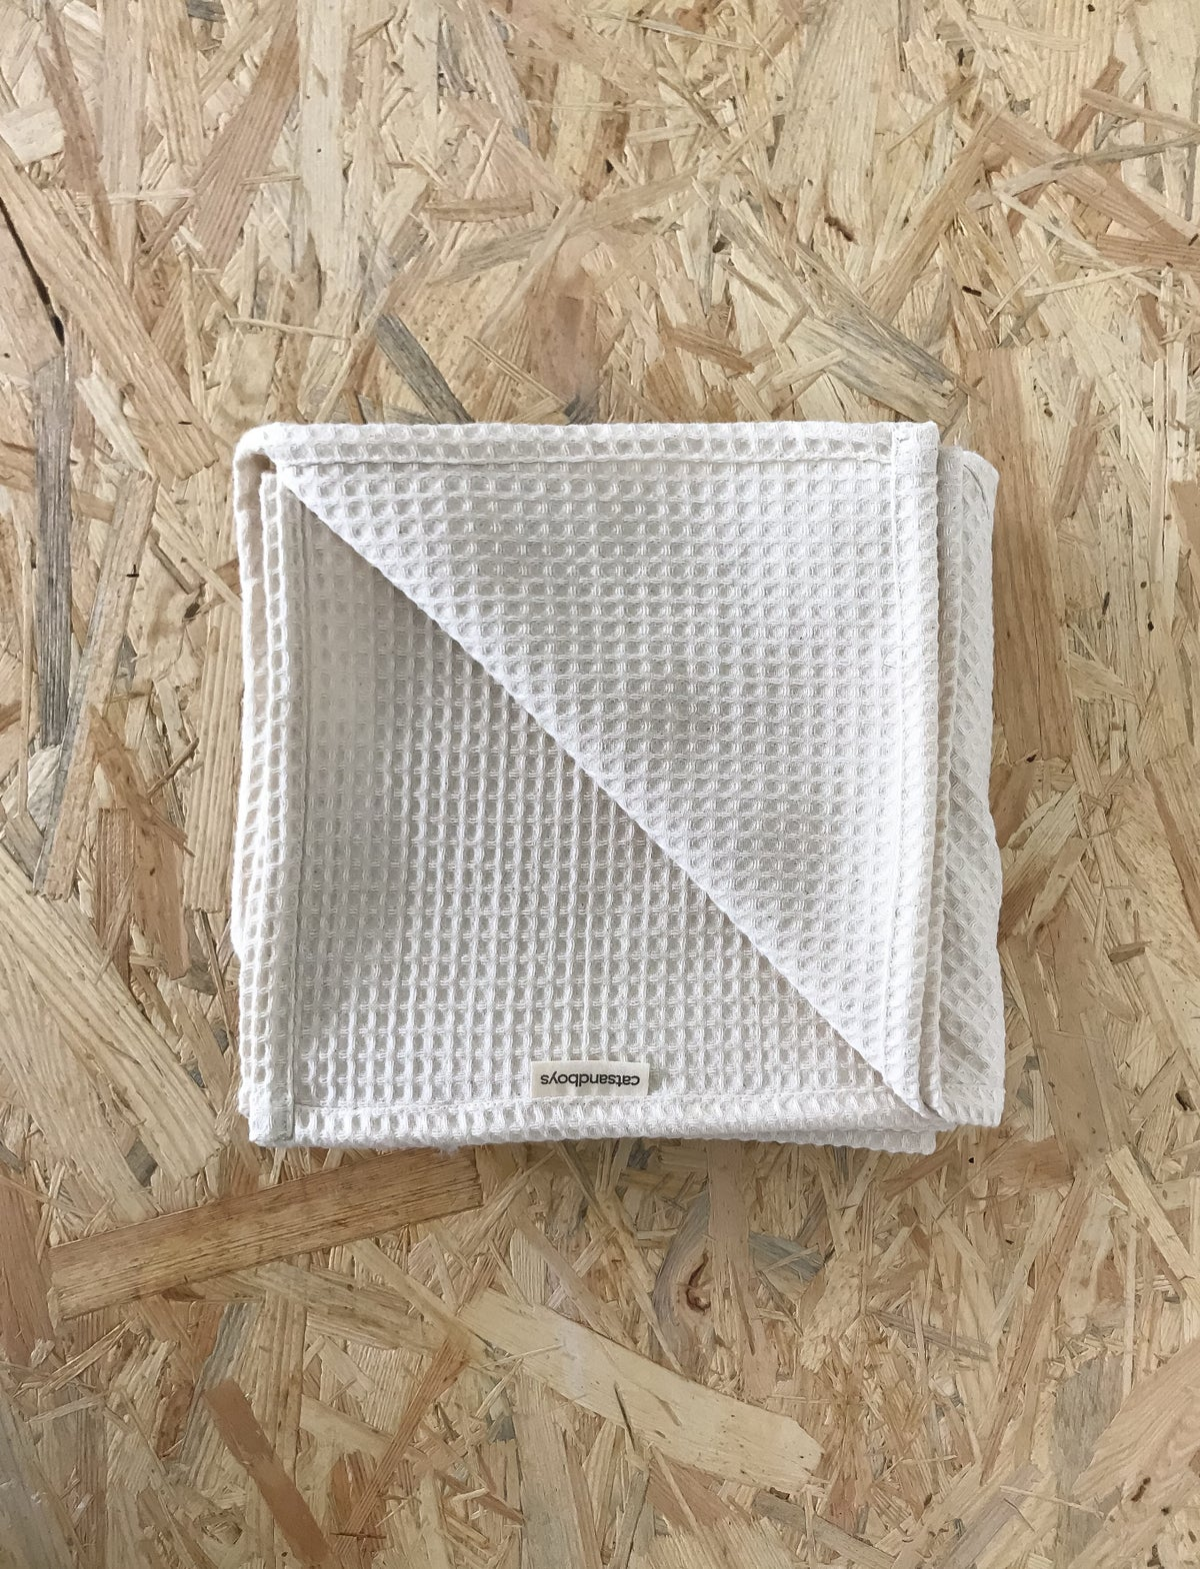 Image of waffle towel